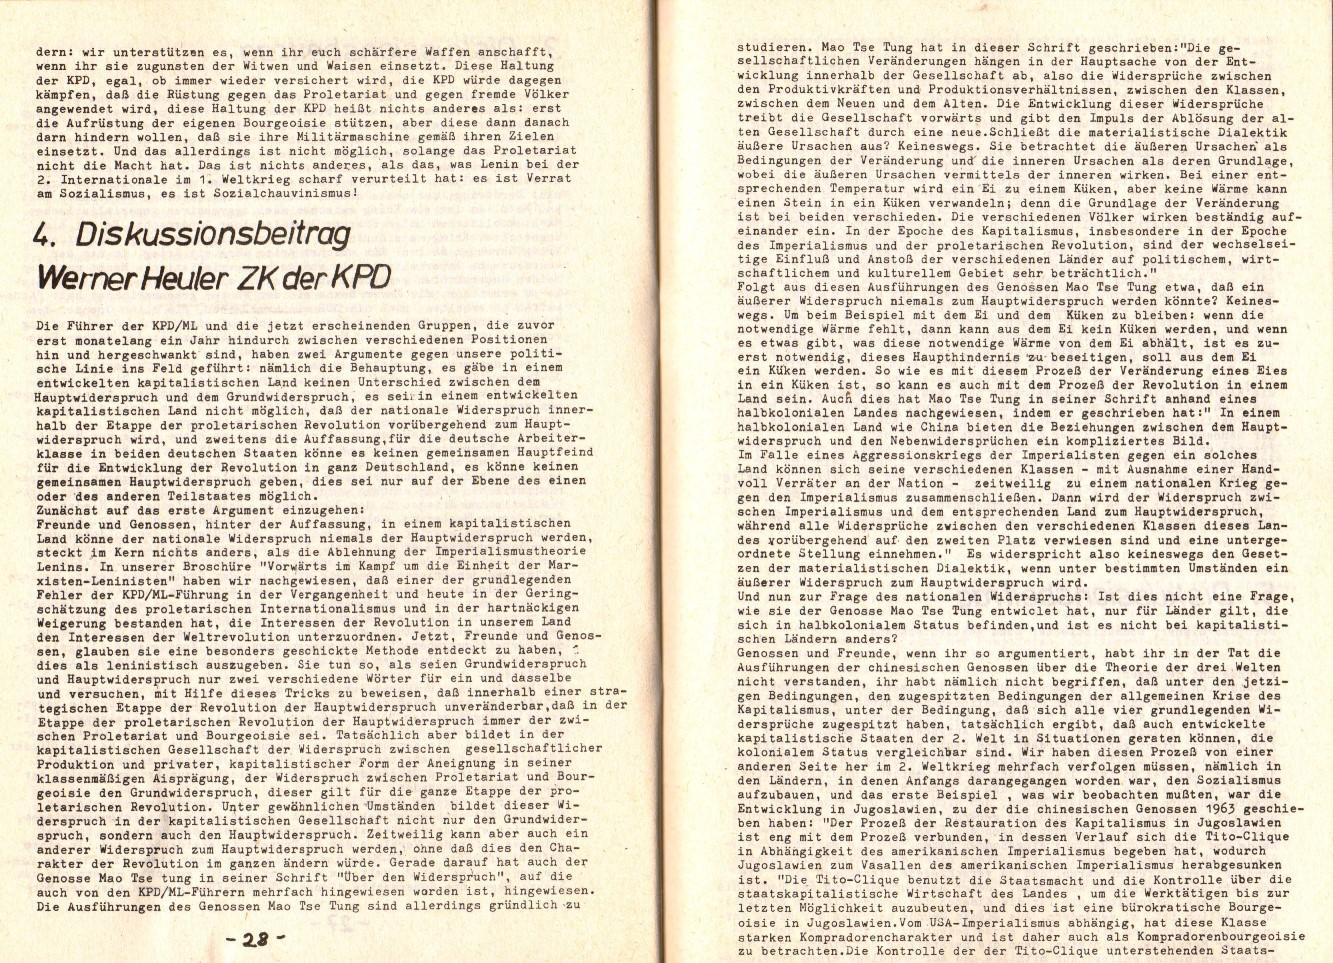 Berlin_AO_1976_Veranstaltung_mit_KPDML_15